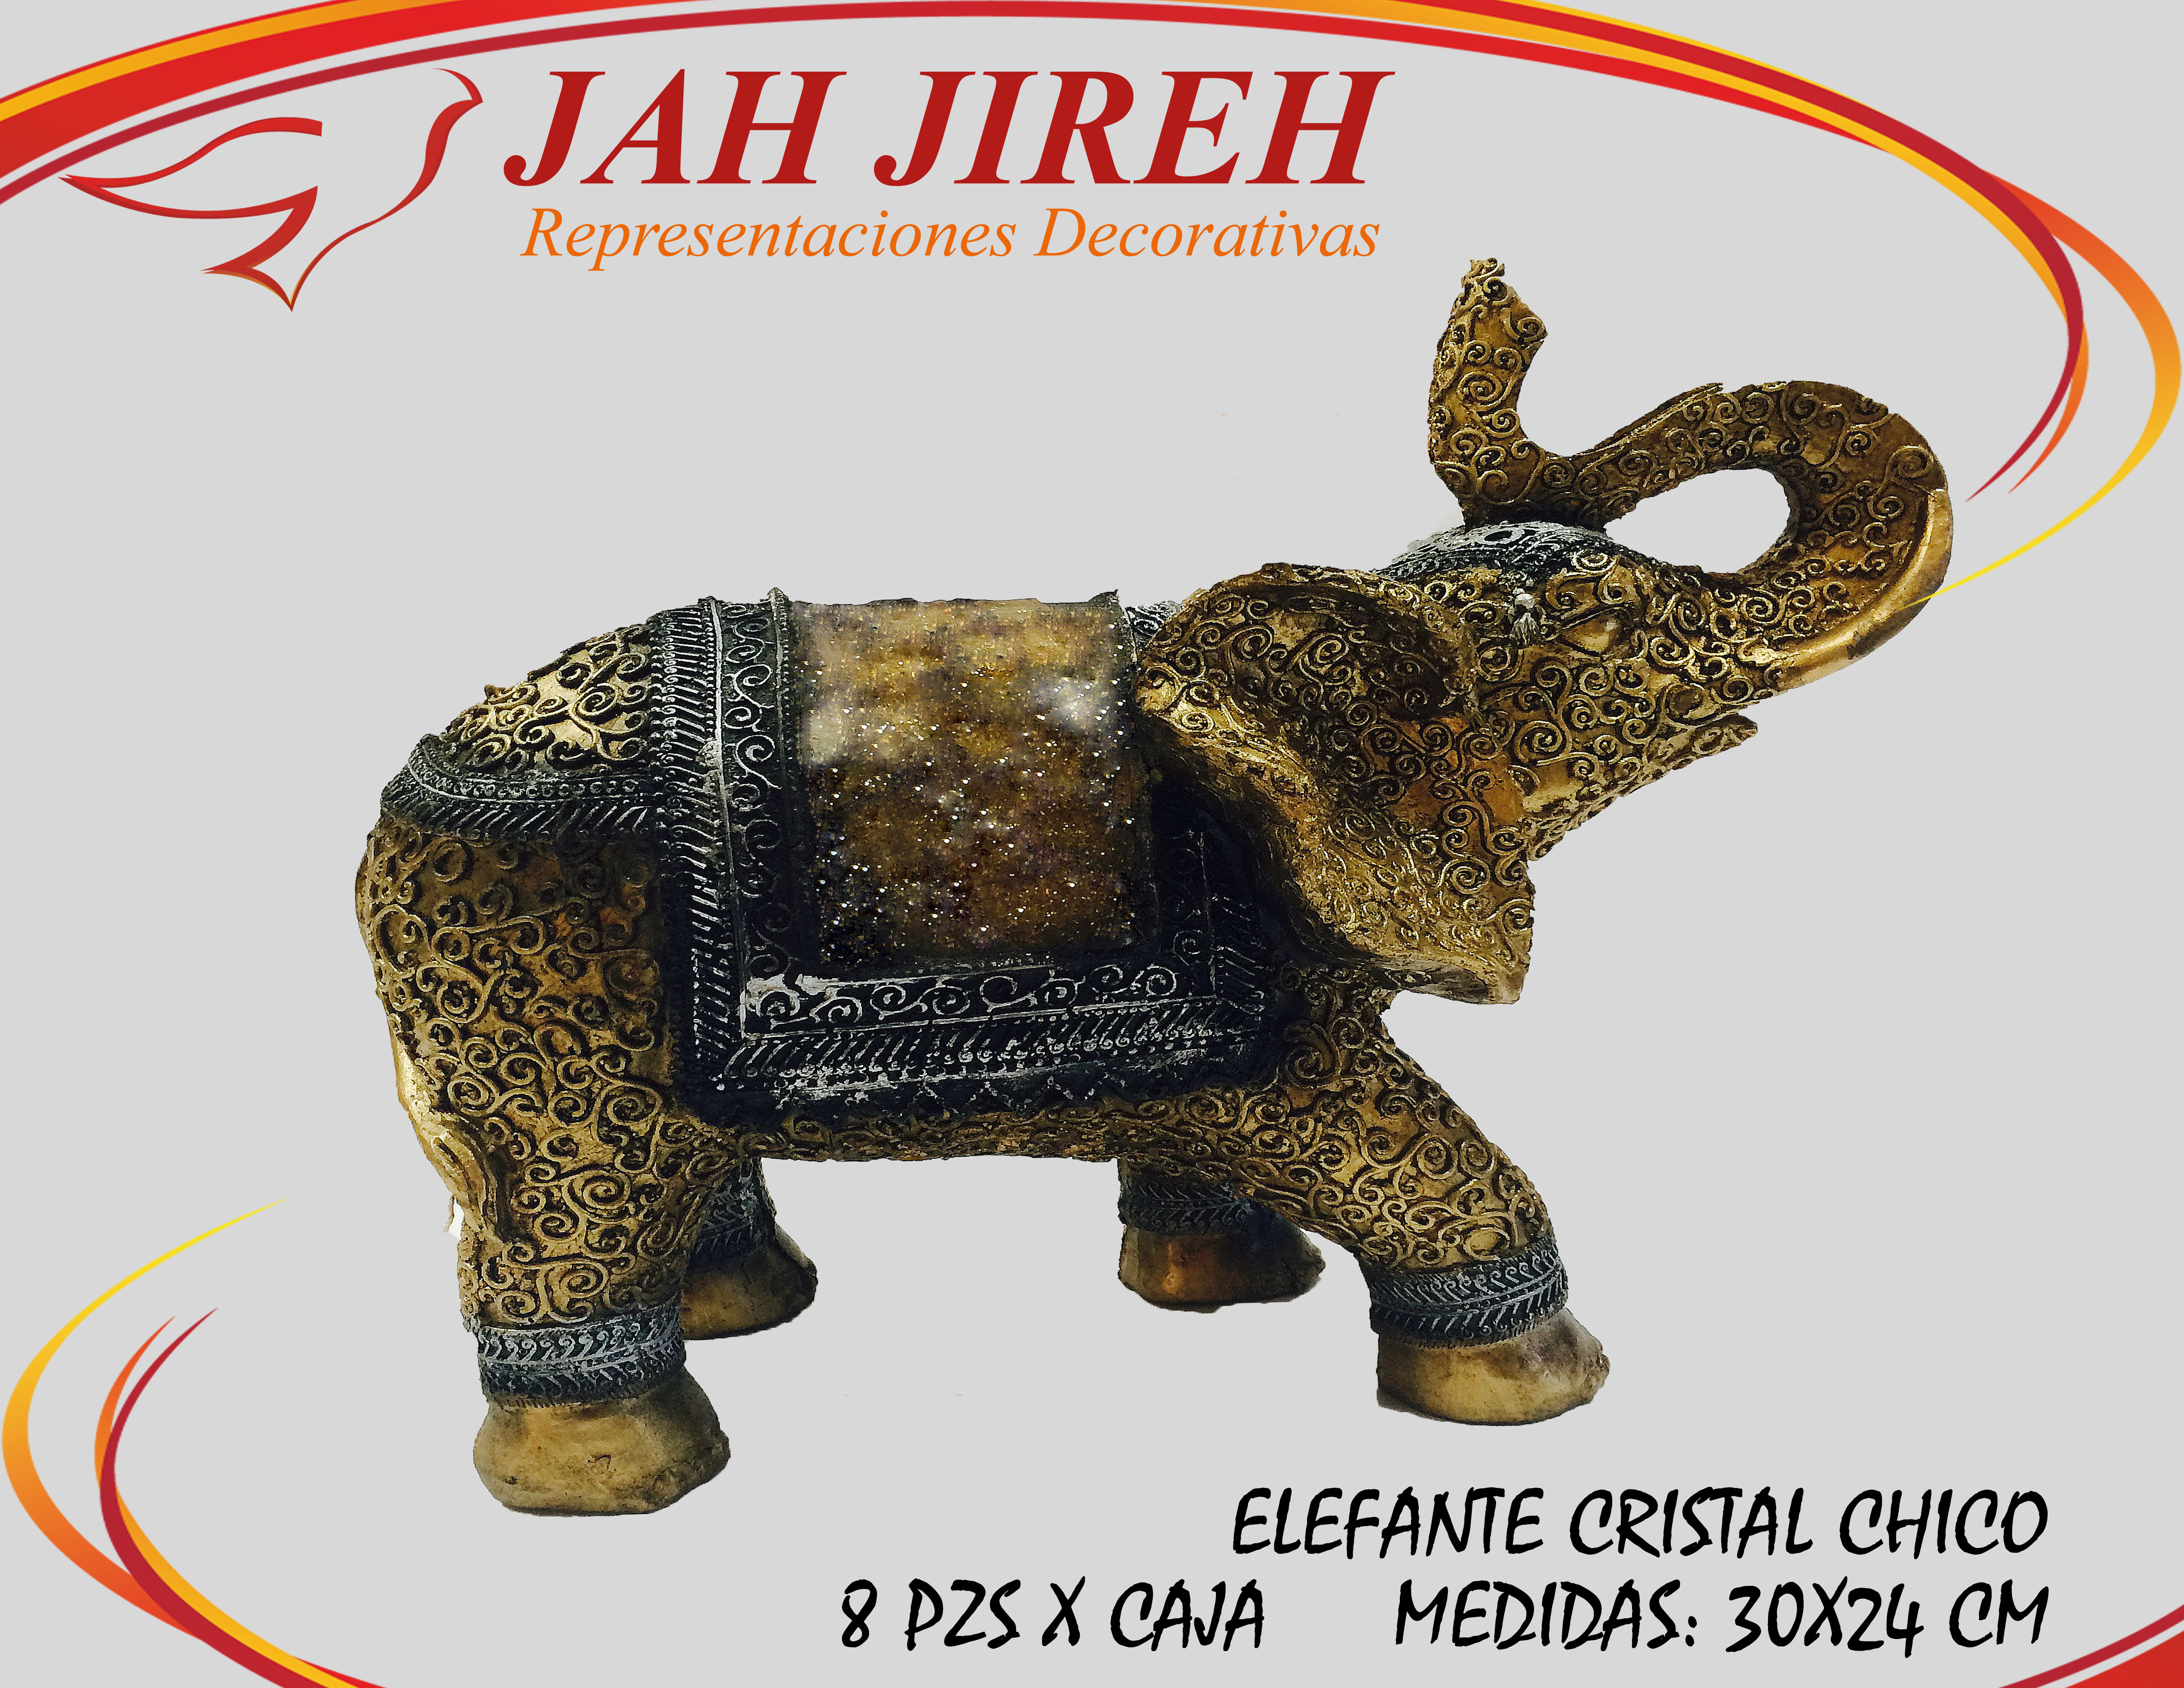 https://0201.nccdn.net/1_2/000/000/17e/07f/elefante-cristal-chico.jpg